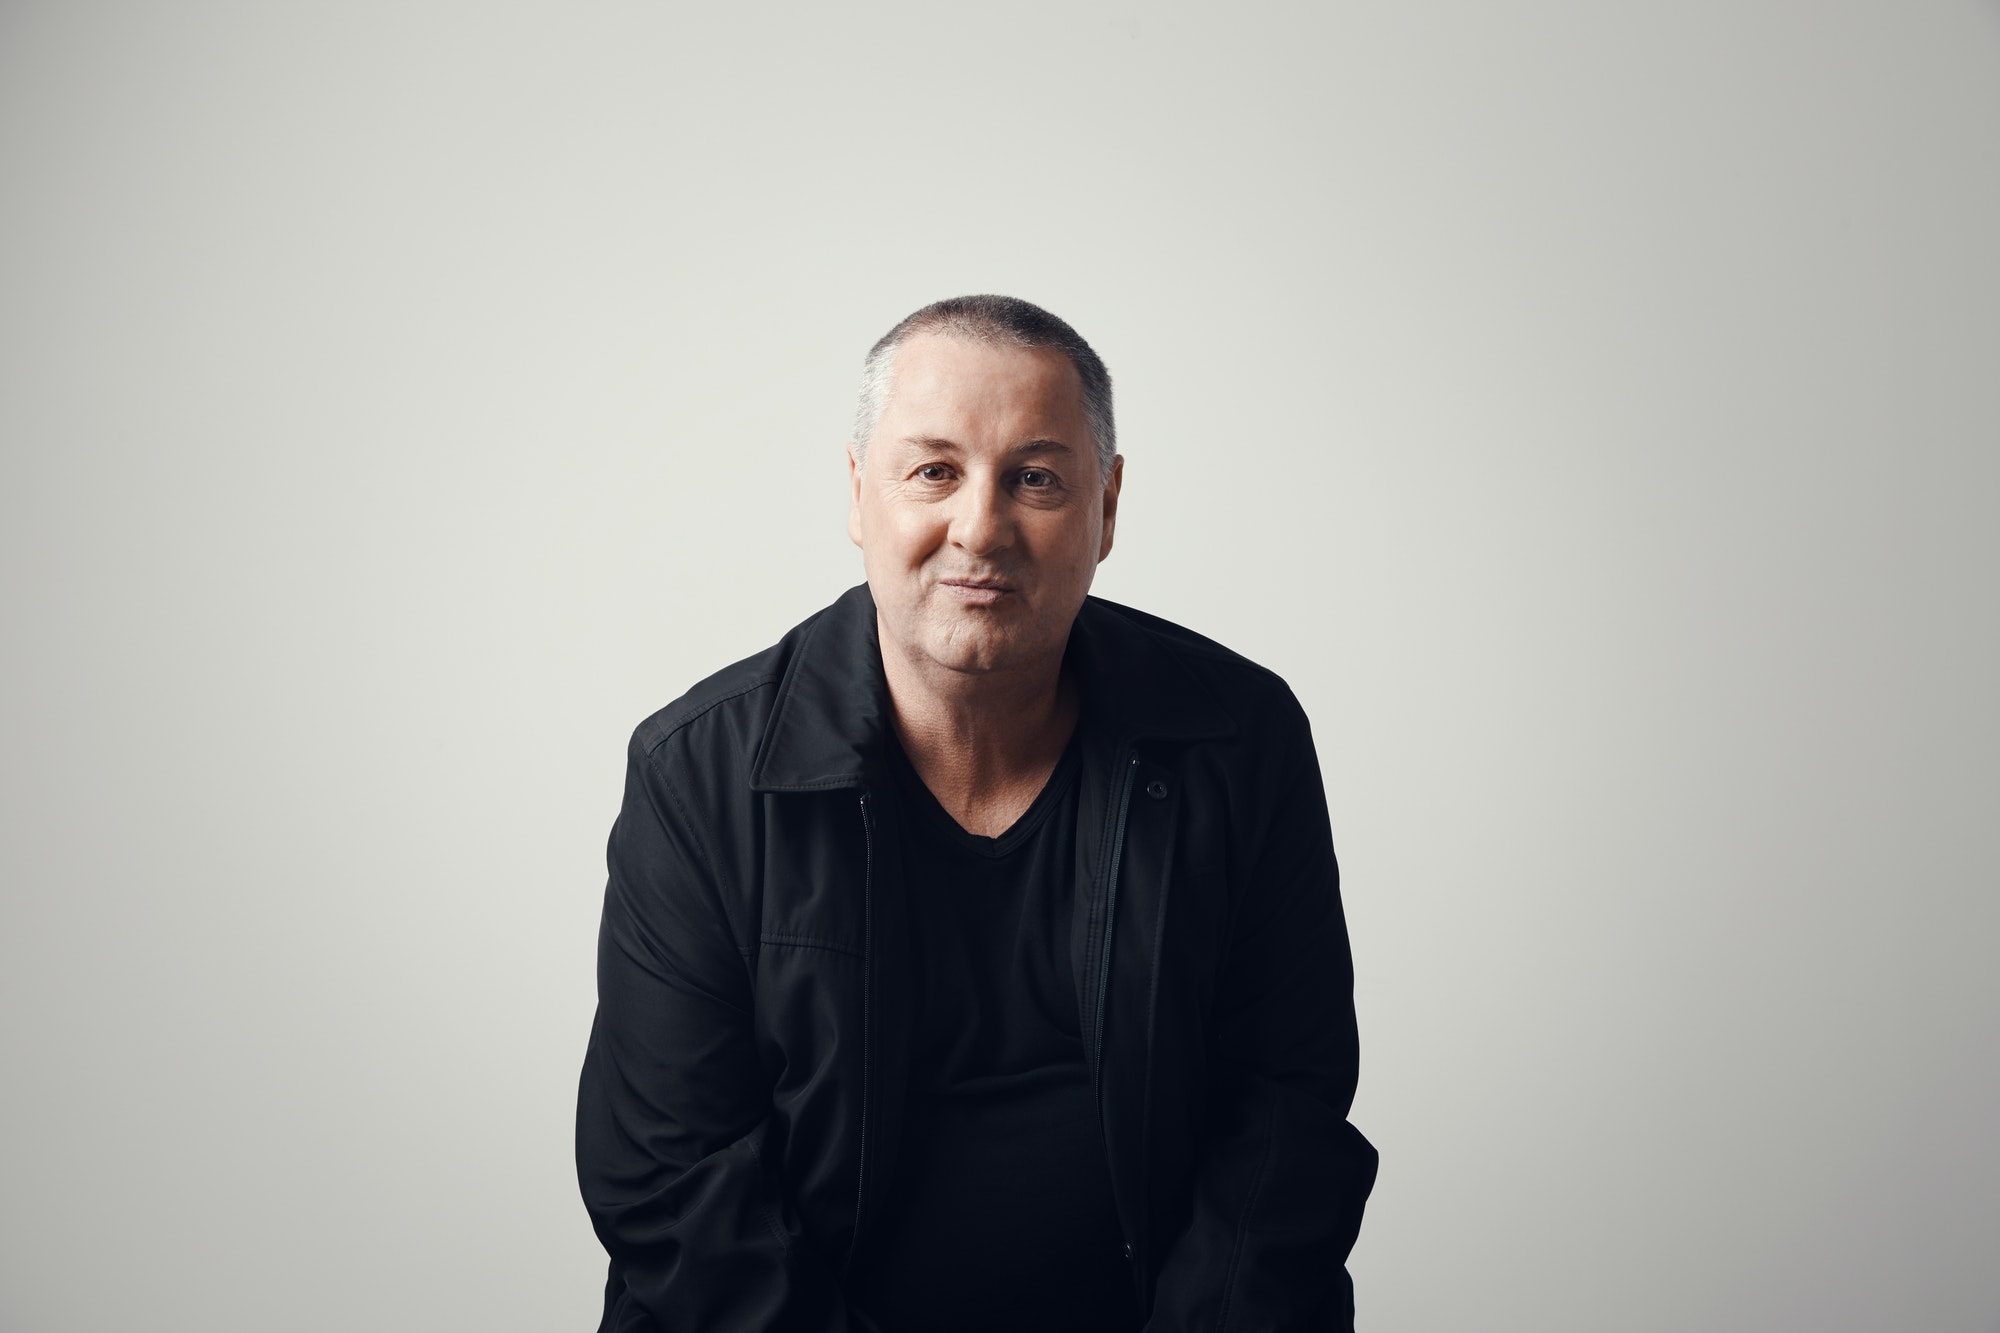 Composer John Murphy Portrait 0255